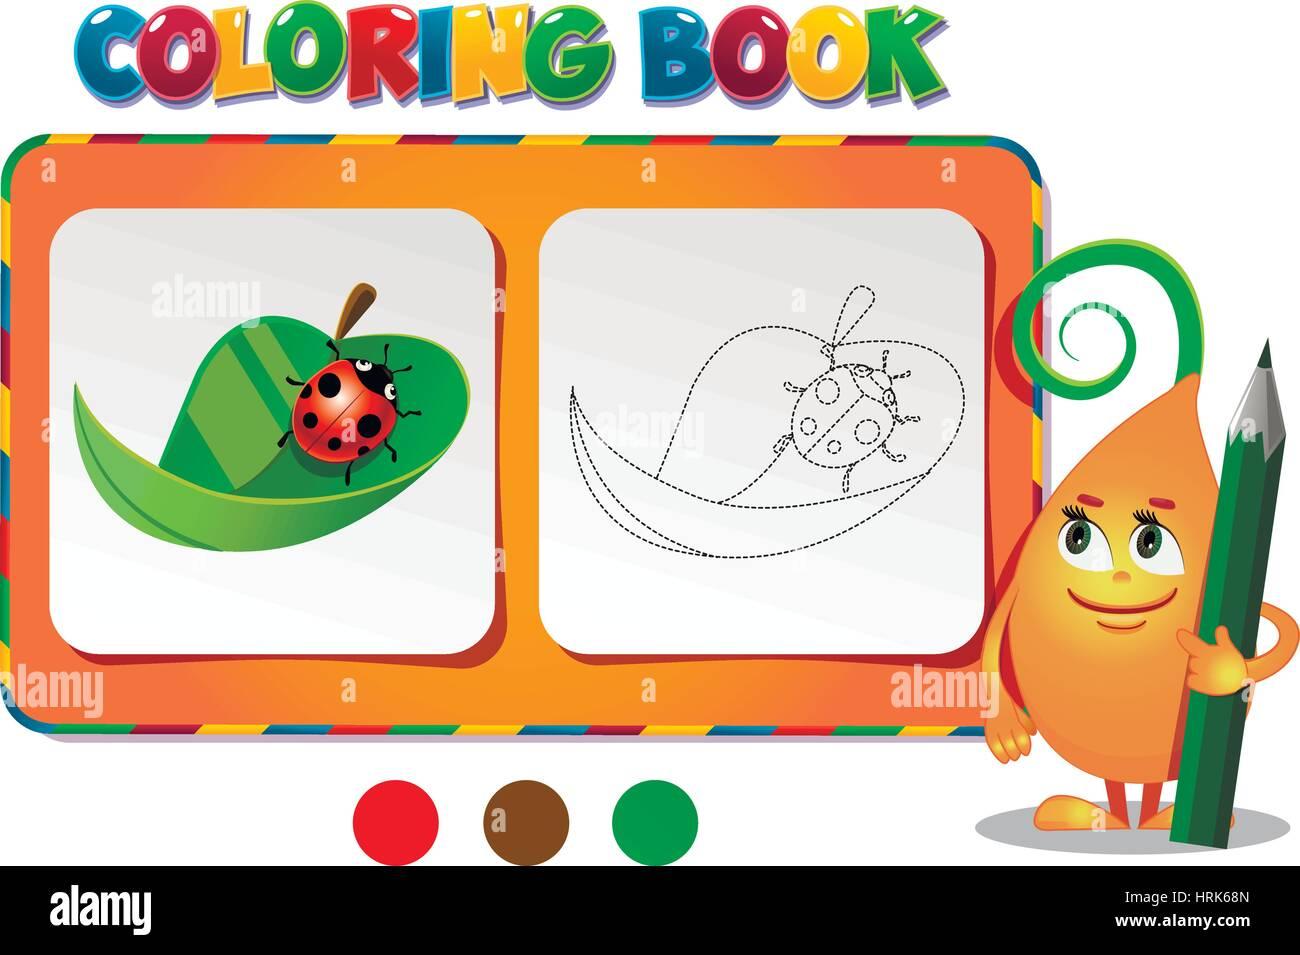 Coloring book ladybug on a leaf - vector illustration. - Stock Image